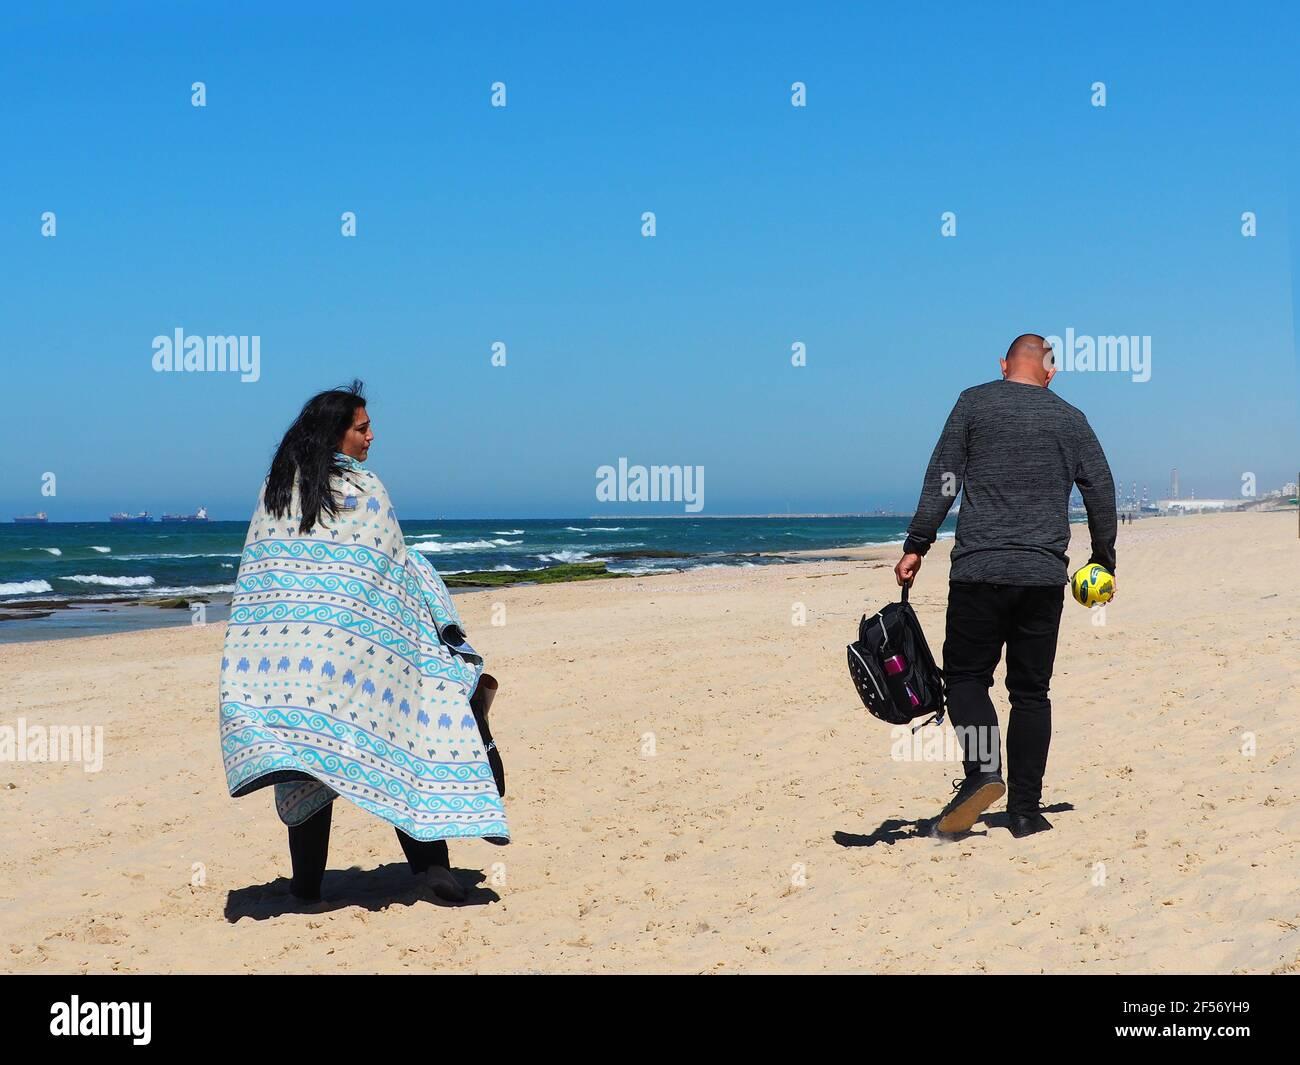 Nitzanim beach, Israel - 6 March, 2021: Family couple on the beach. Stock Photo